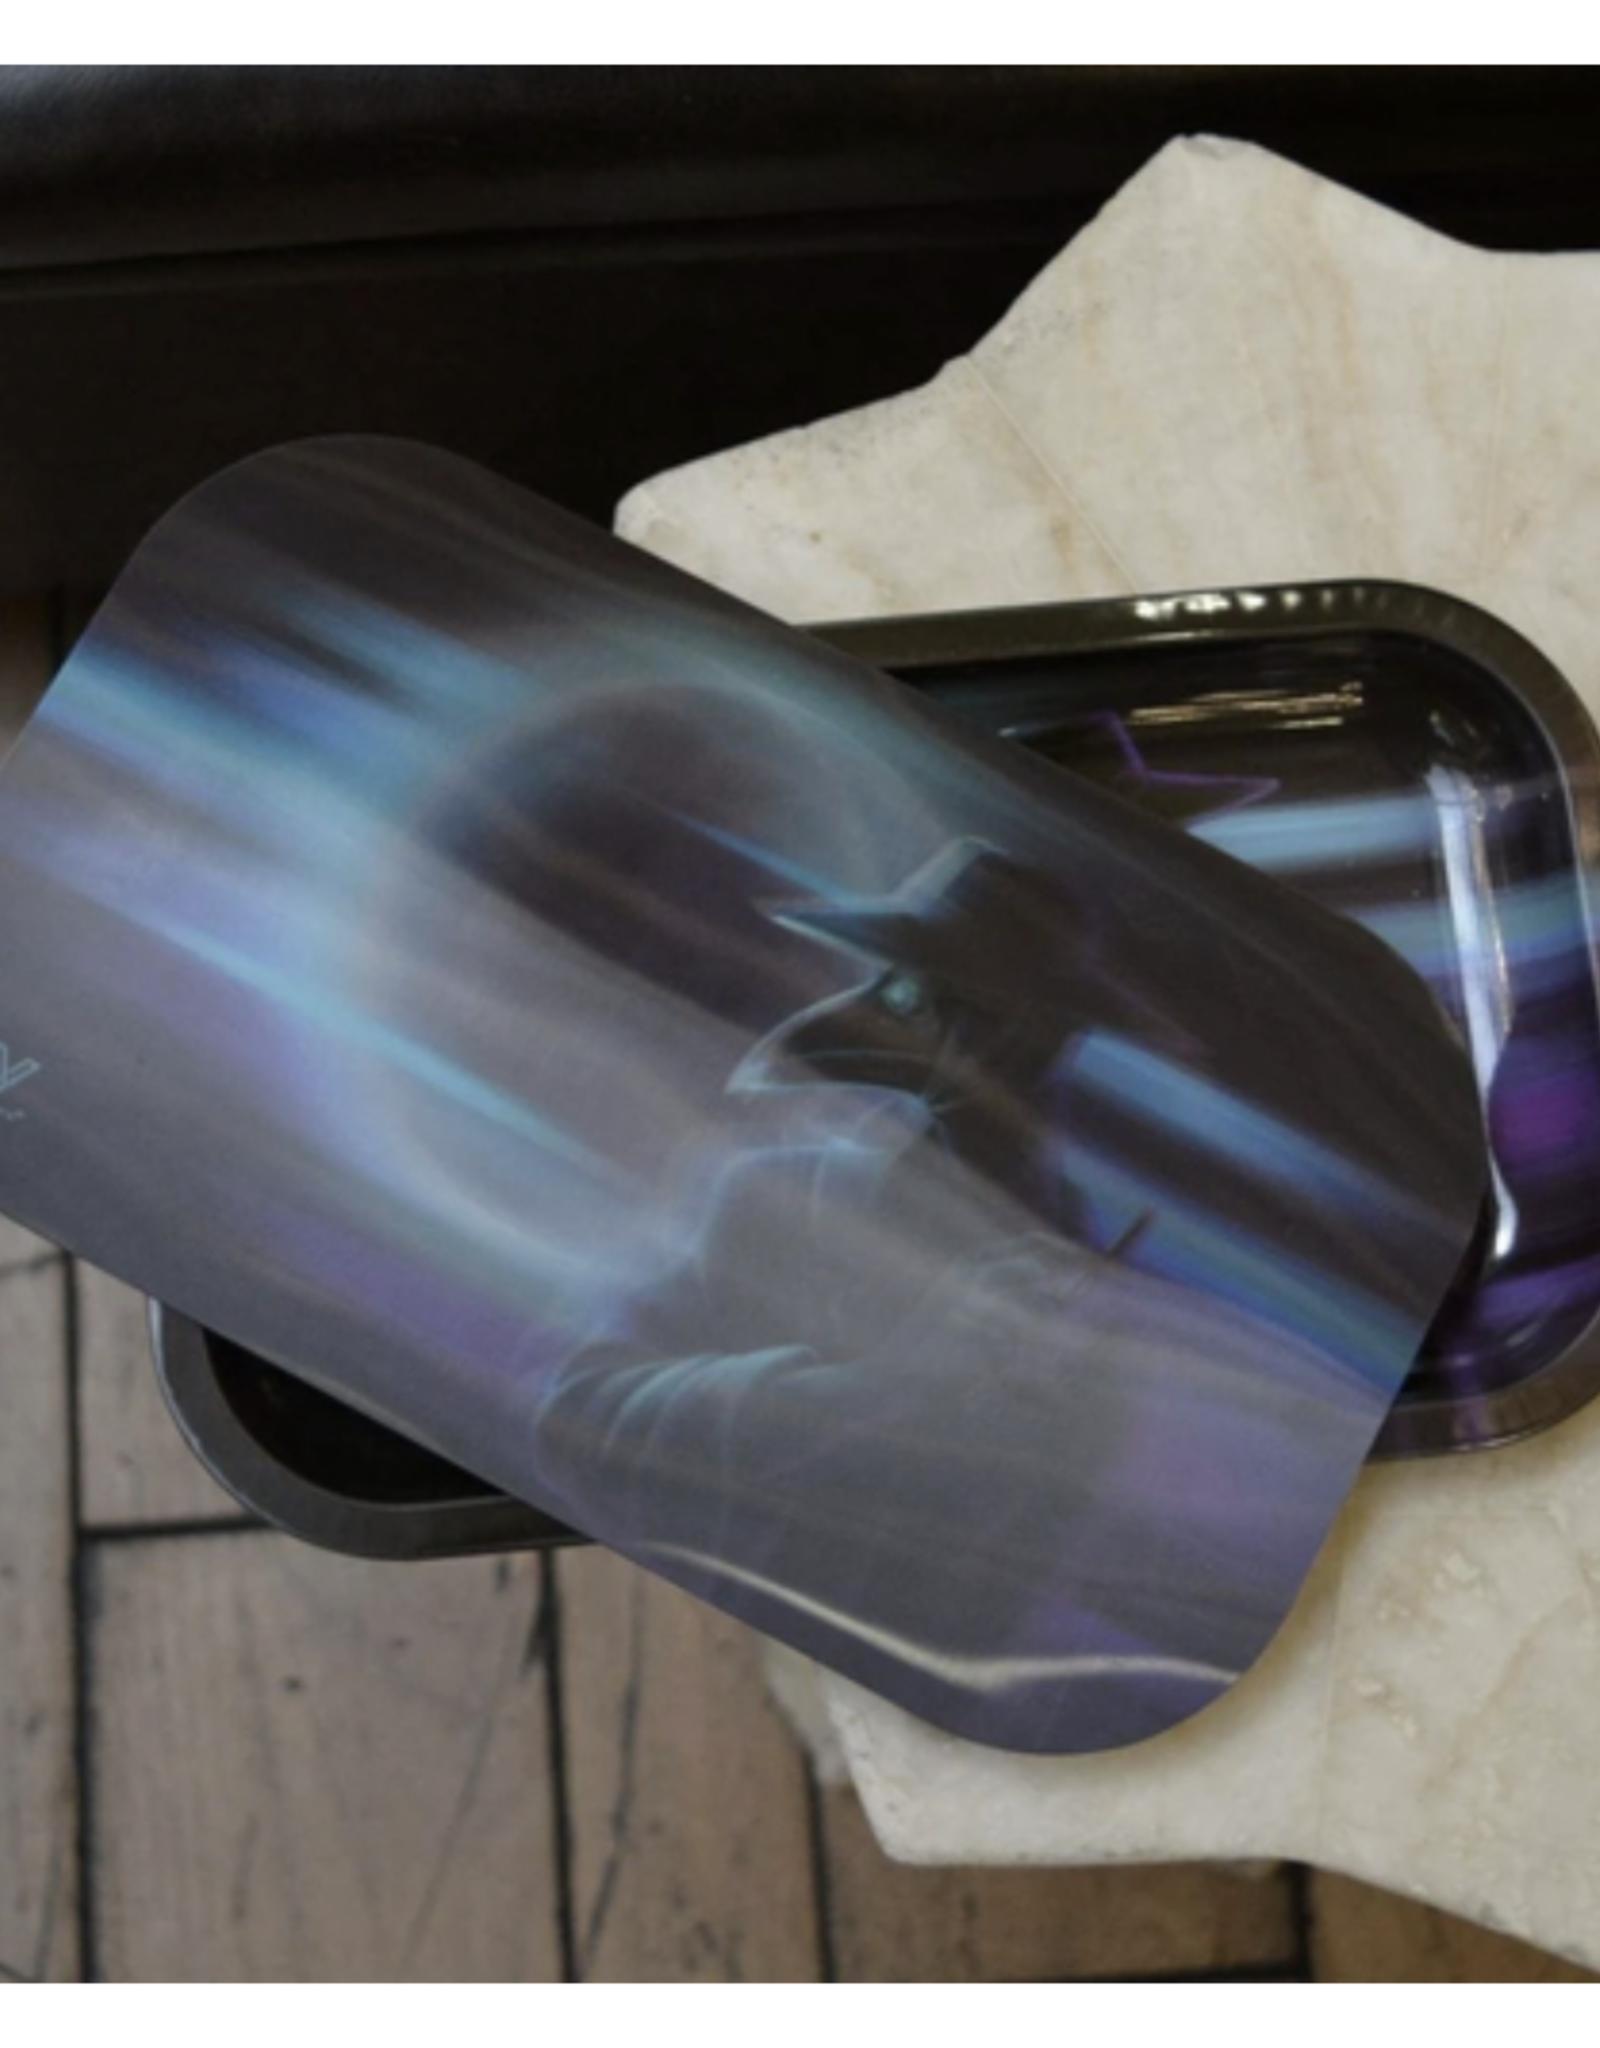 Dark Traveller Roll N Go (3D) Metal Tray and 3D Mag Slap